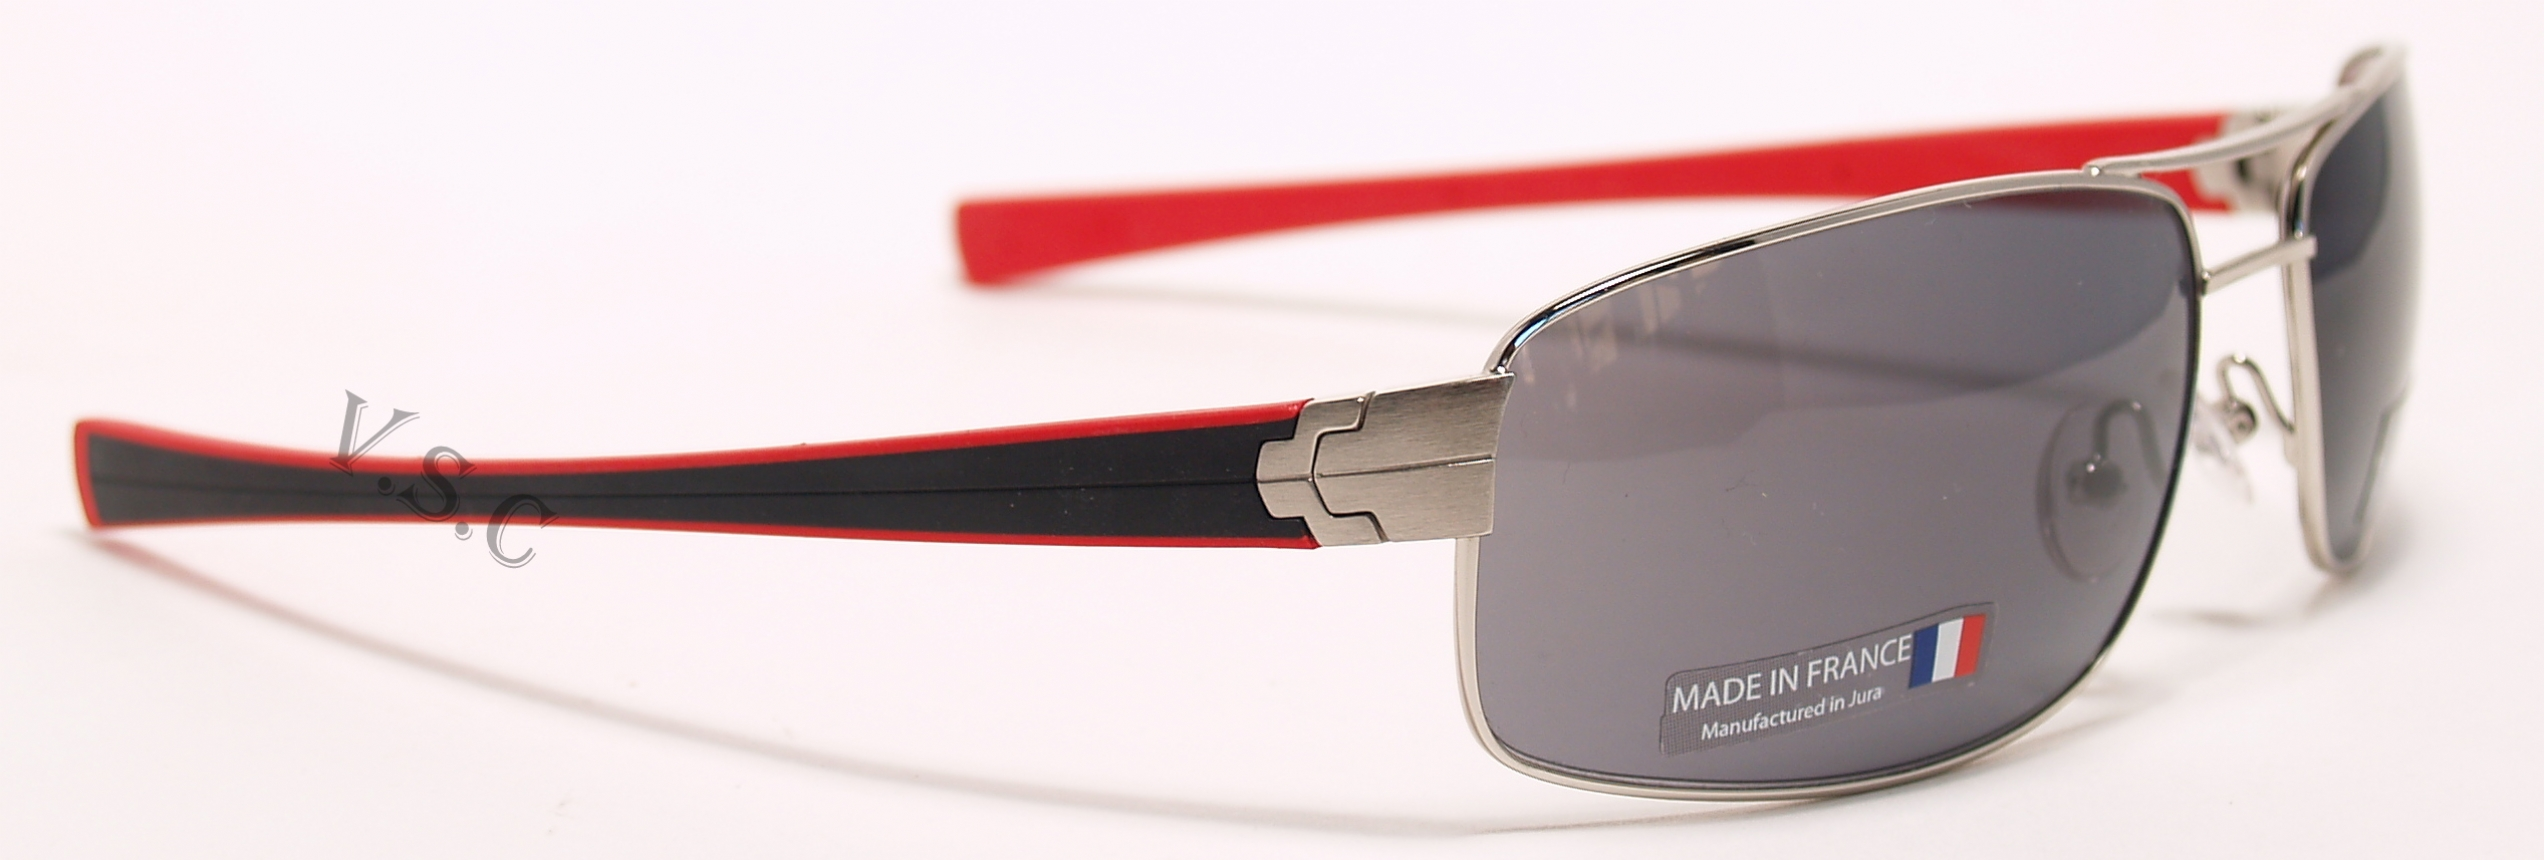 247c97e34639 Tag Heuer 0251 Lrs Sunglasses